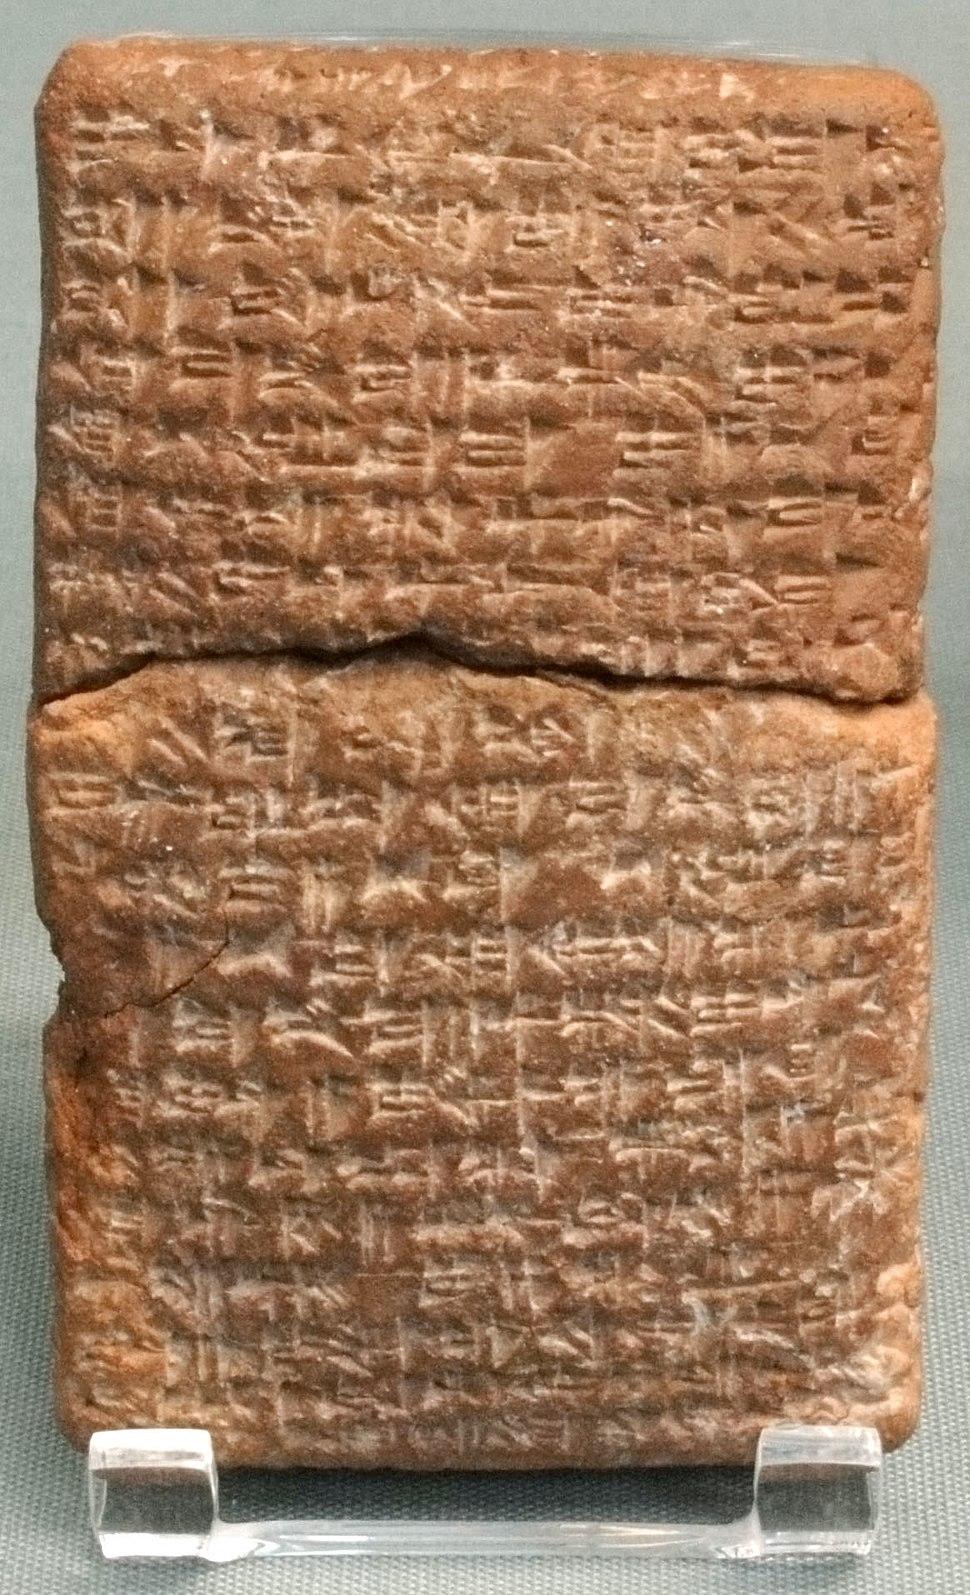 Slave treaty tablet